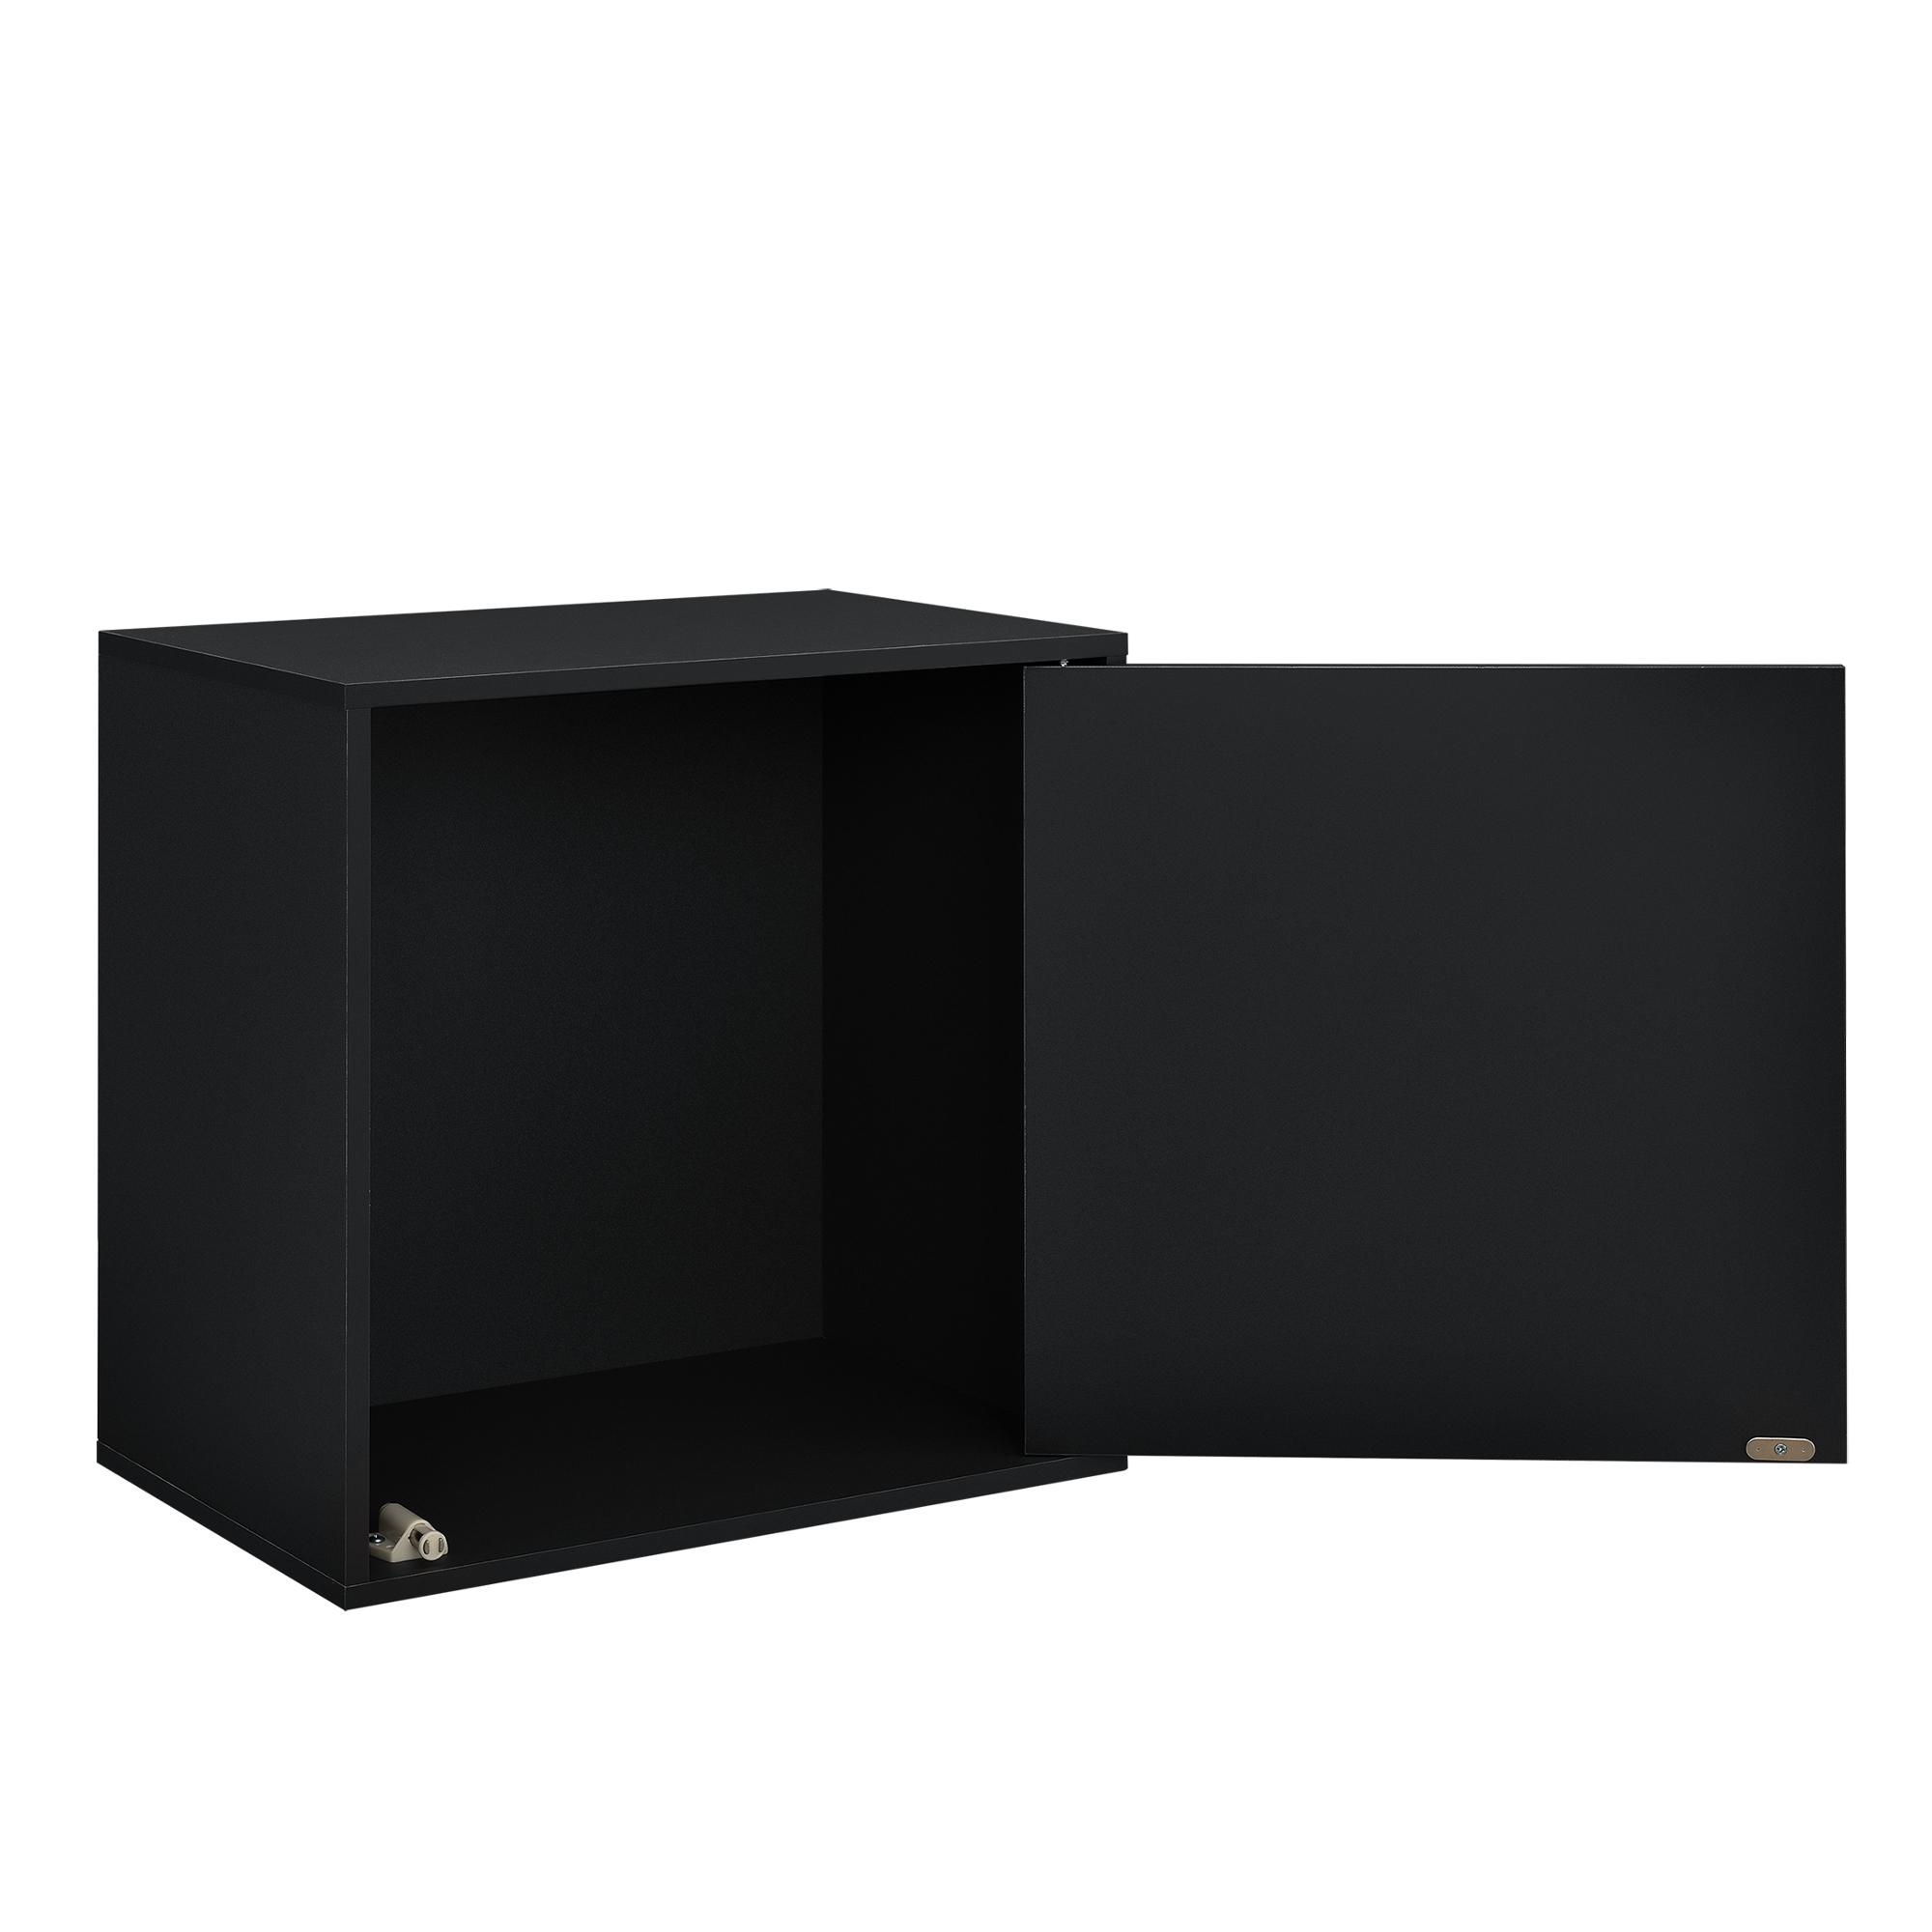 h ngeschrank 45x45x30cm schwarz wandschrank schrank wandregal regal ebay. Black Bedroom Furniture Sets. Home Design Ideas